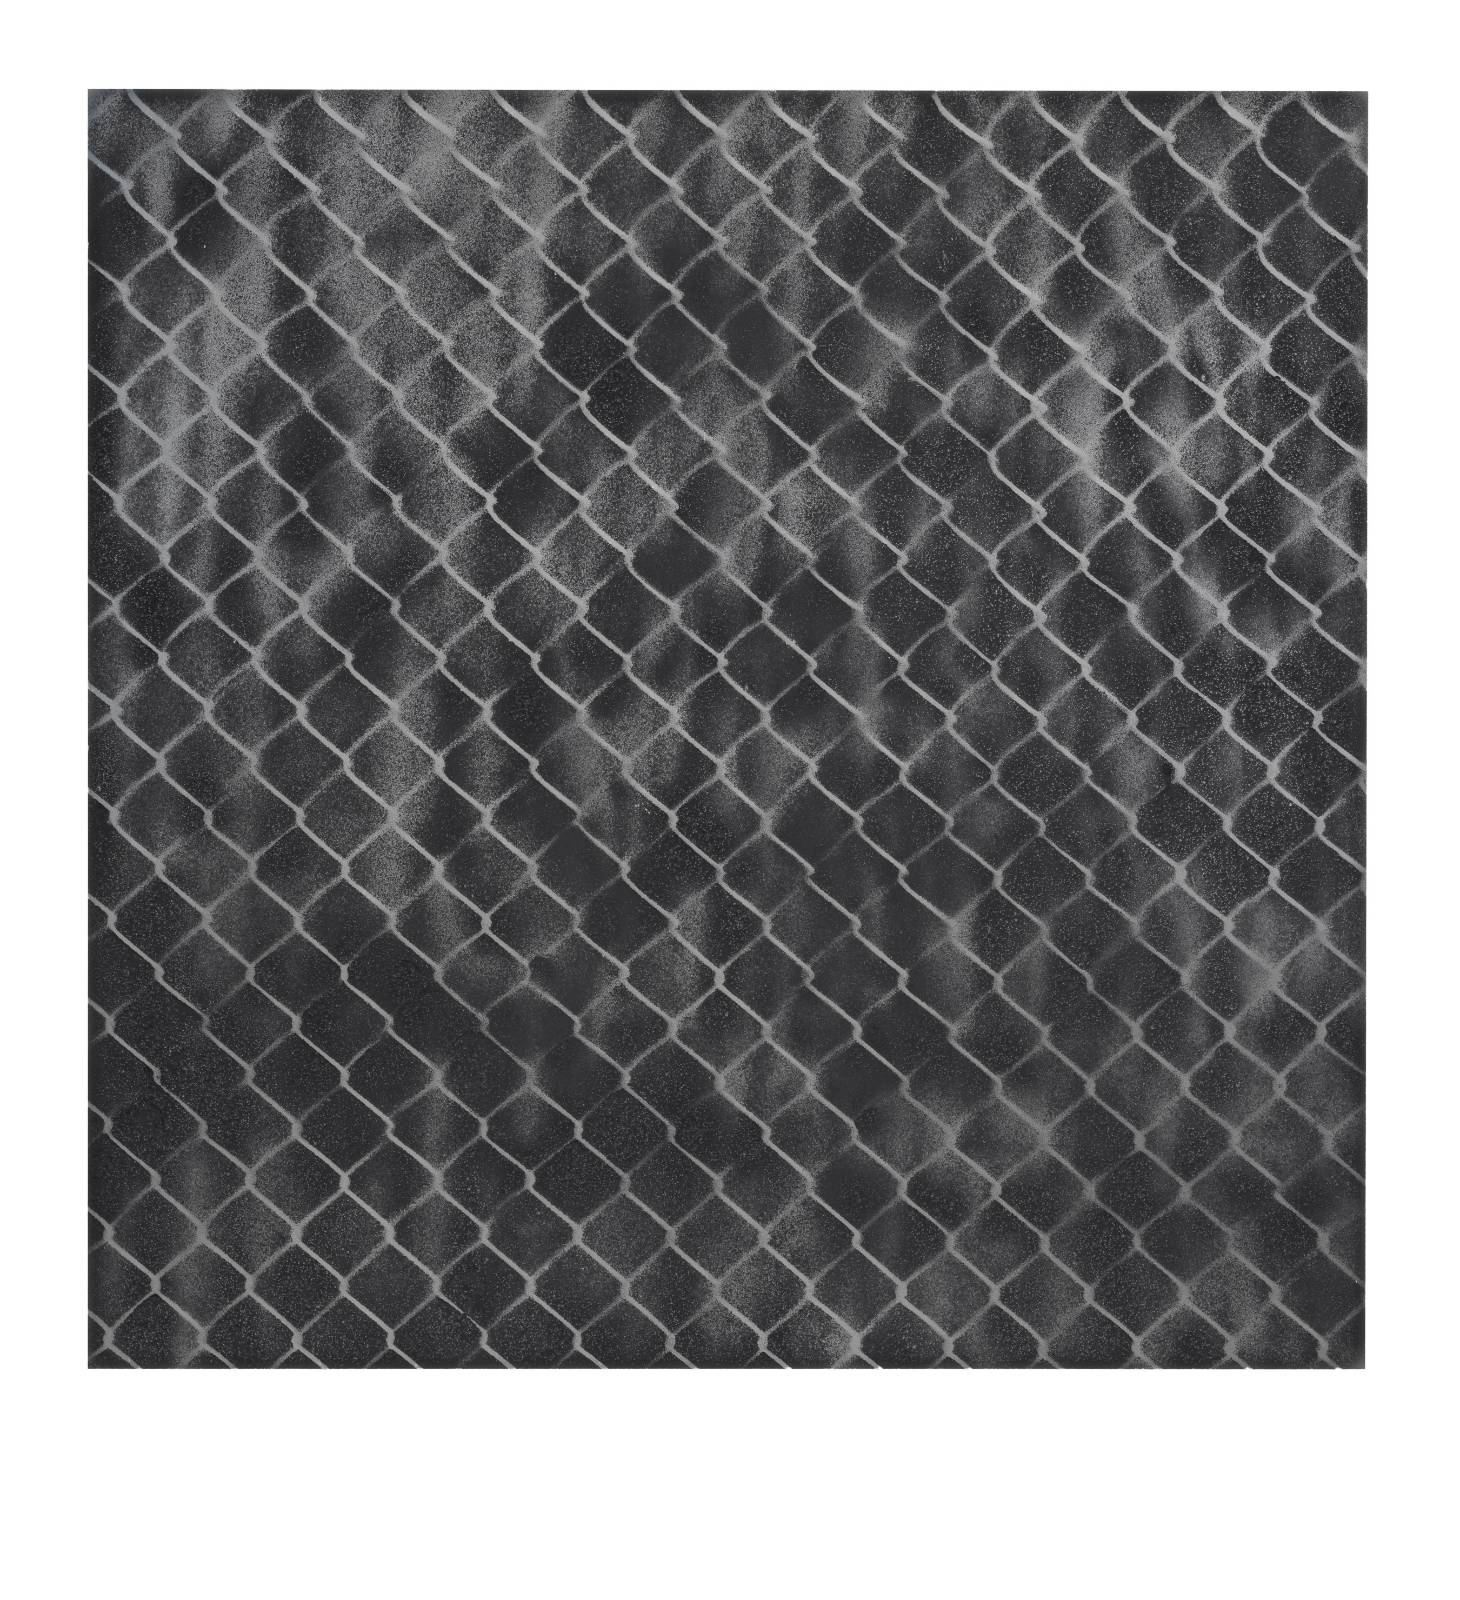 "STAIN : 55°36'48.9""N 13°00'49.6""E, 2016, spraypaint on aluminium, 81,3 x 81,3 cm"